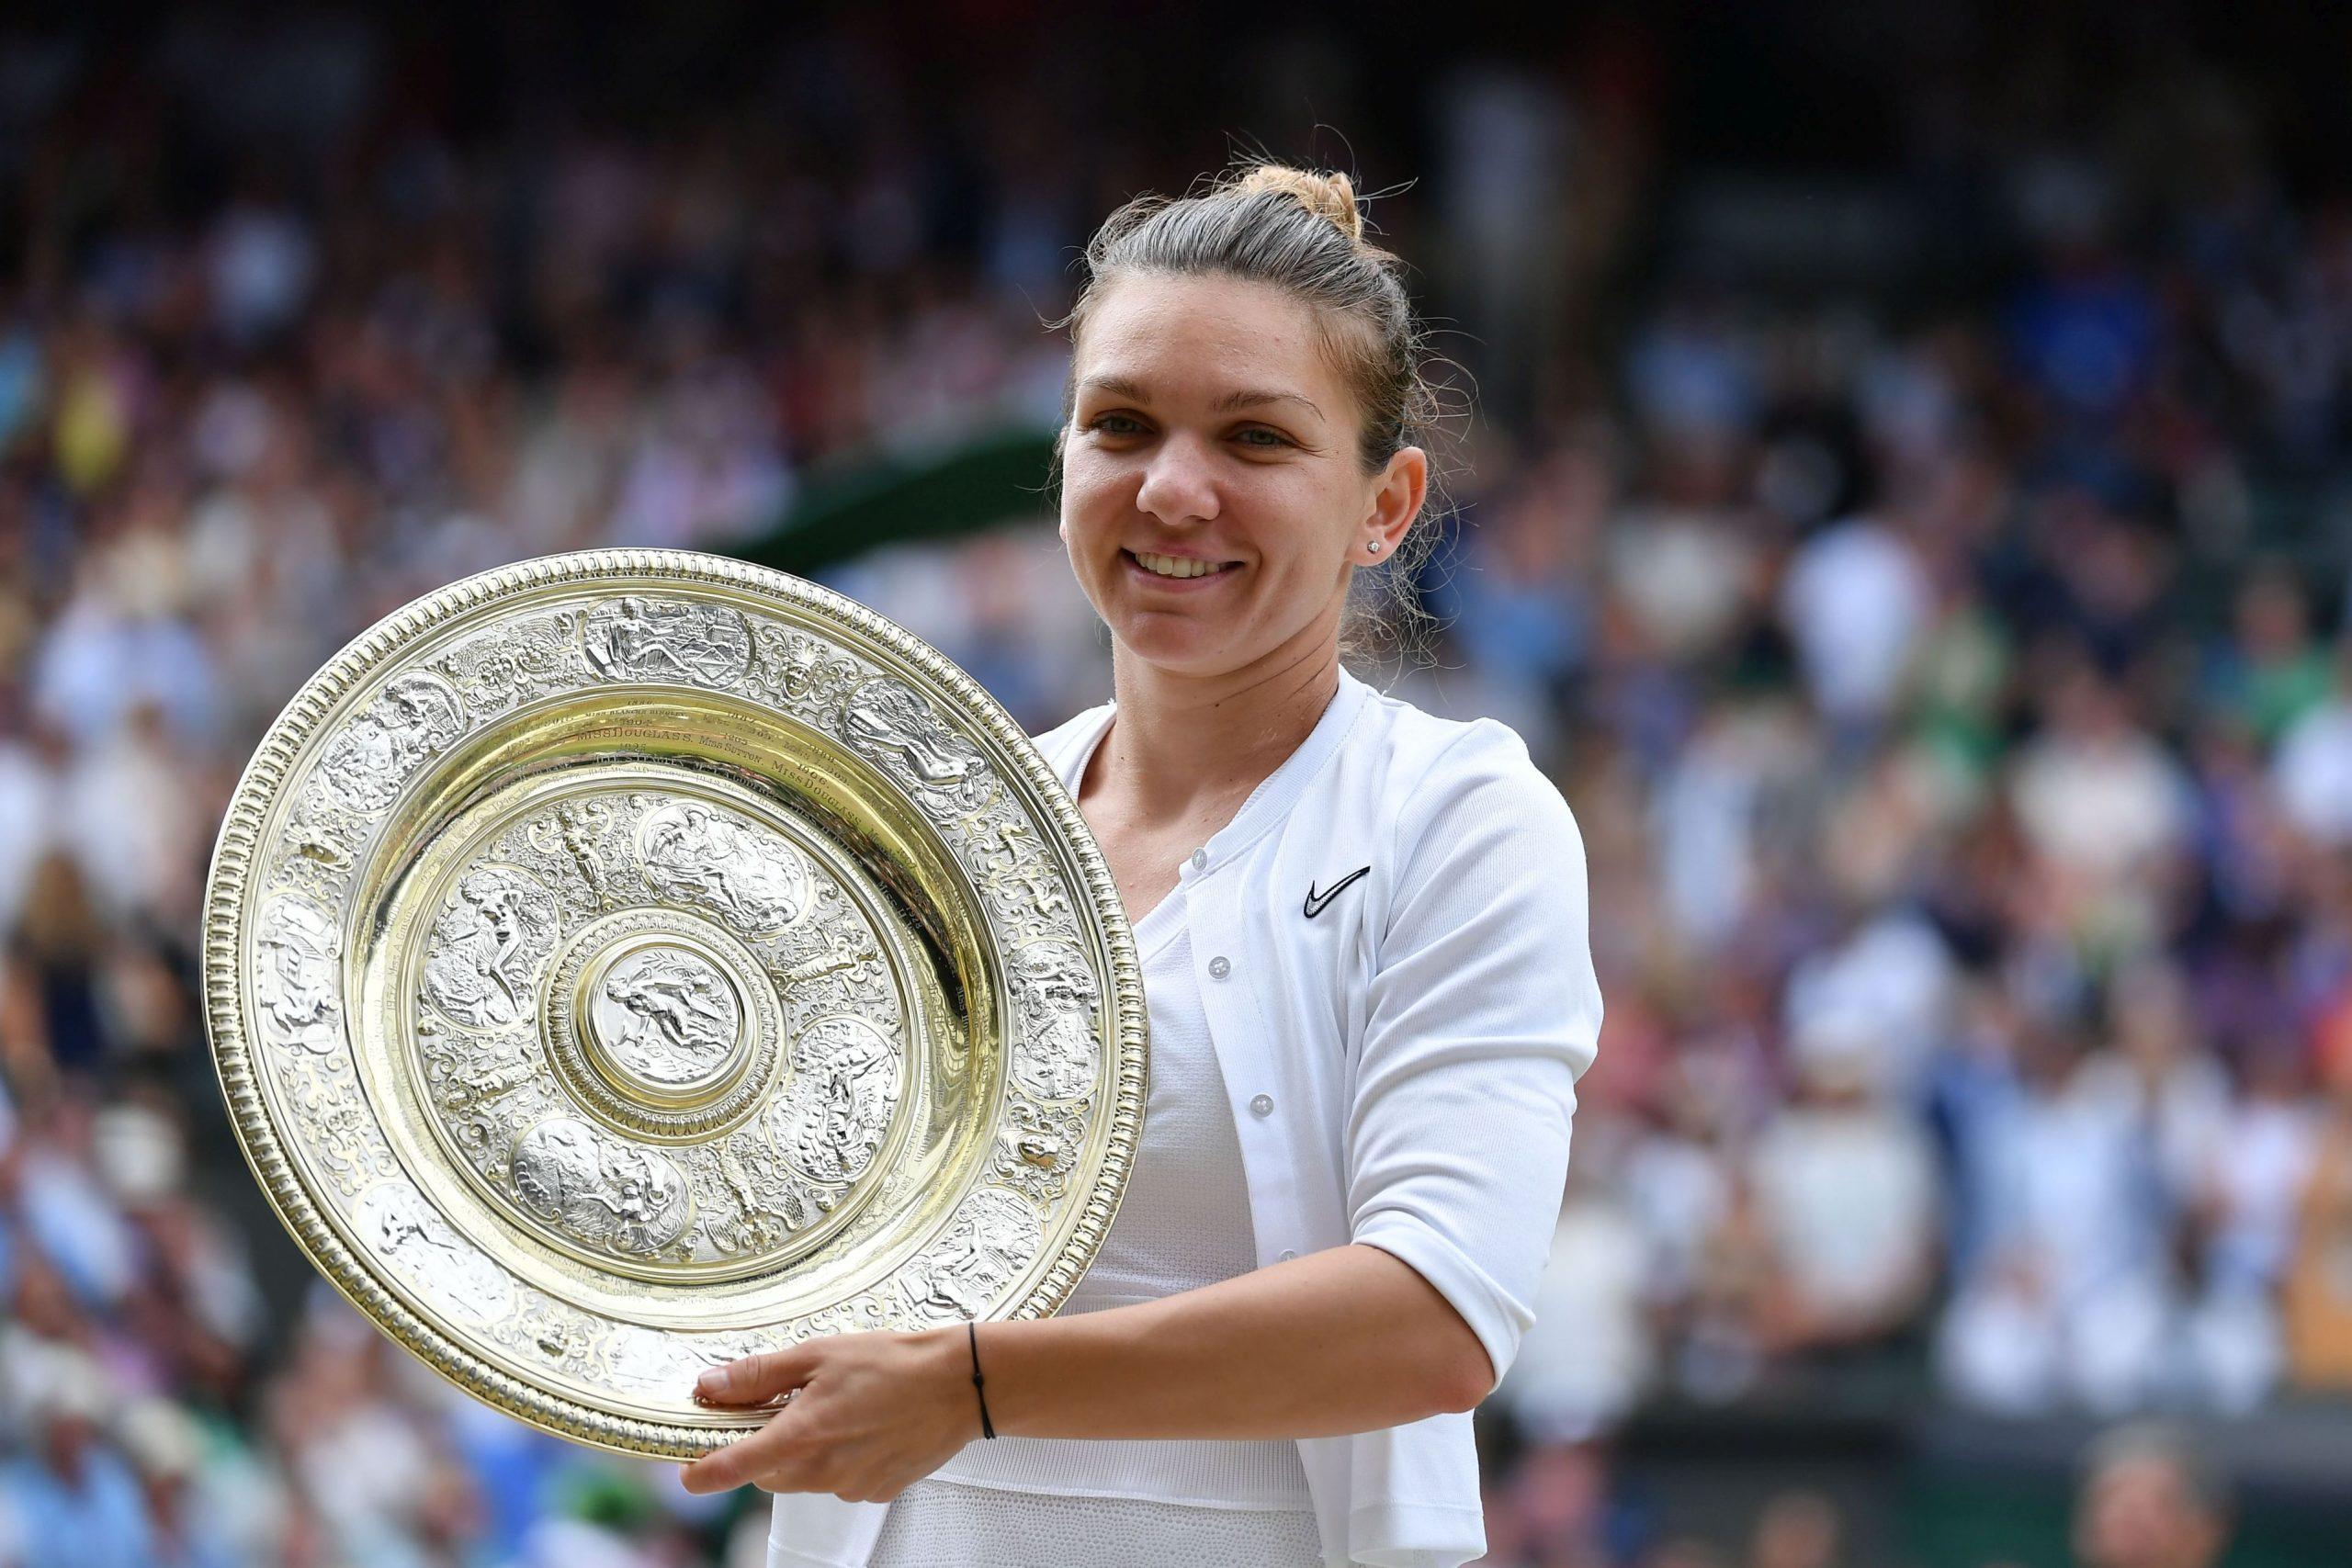 Wimbledon va fi anulat din cauza pandemiei de coronavirus